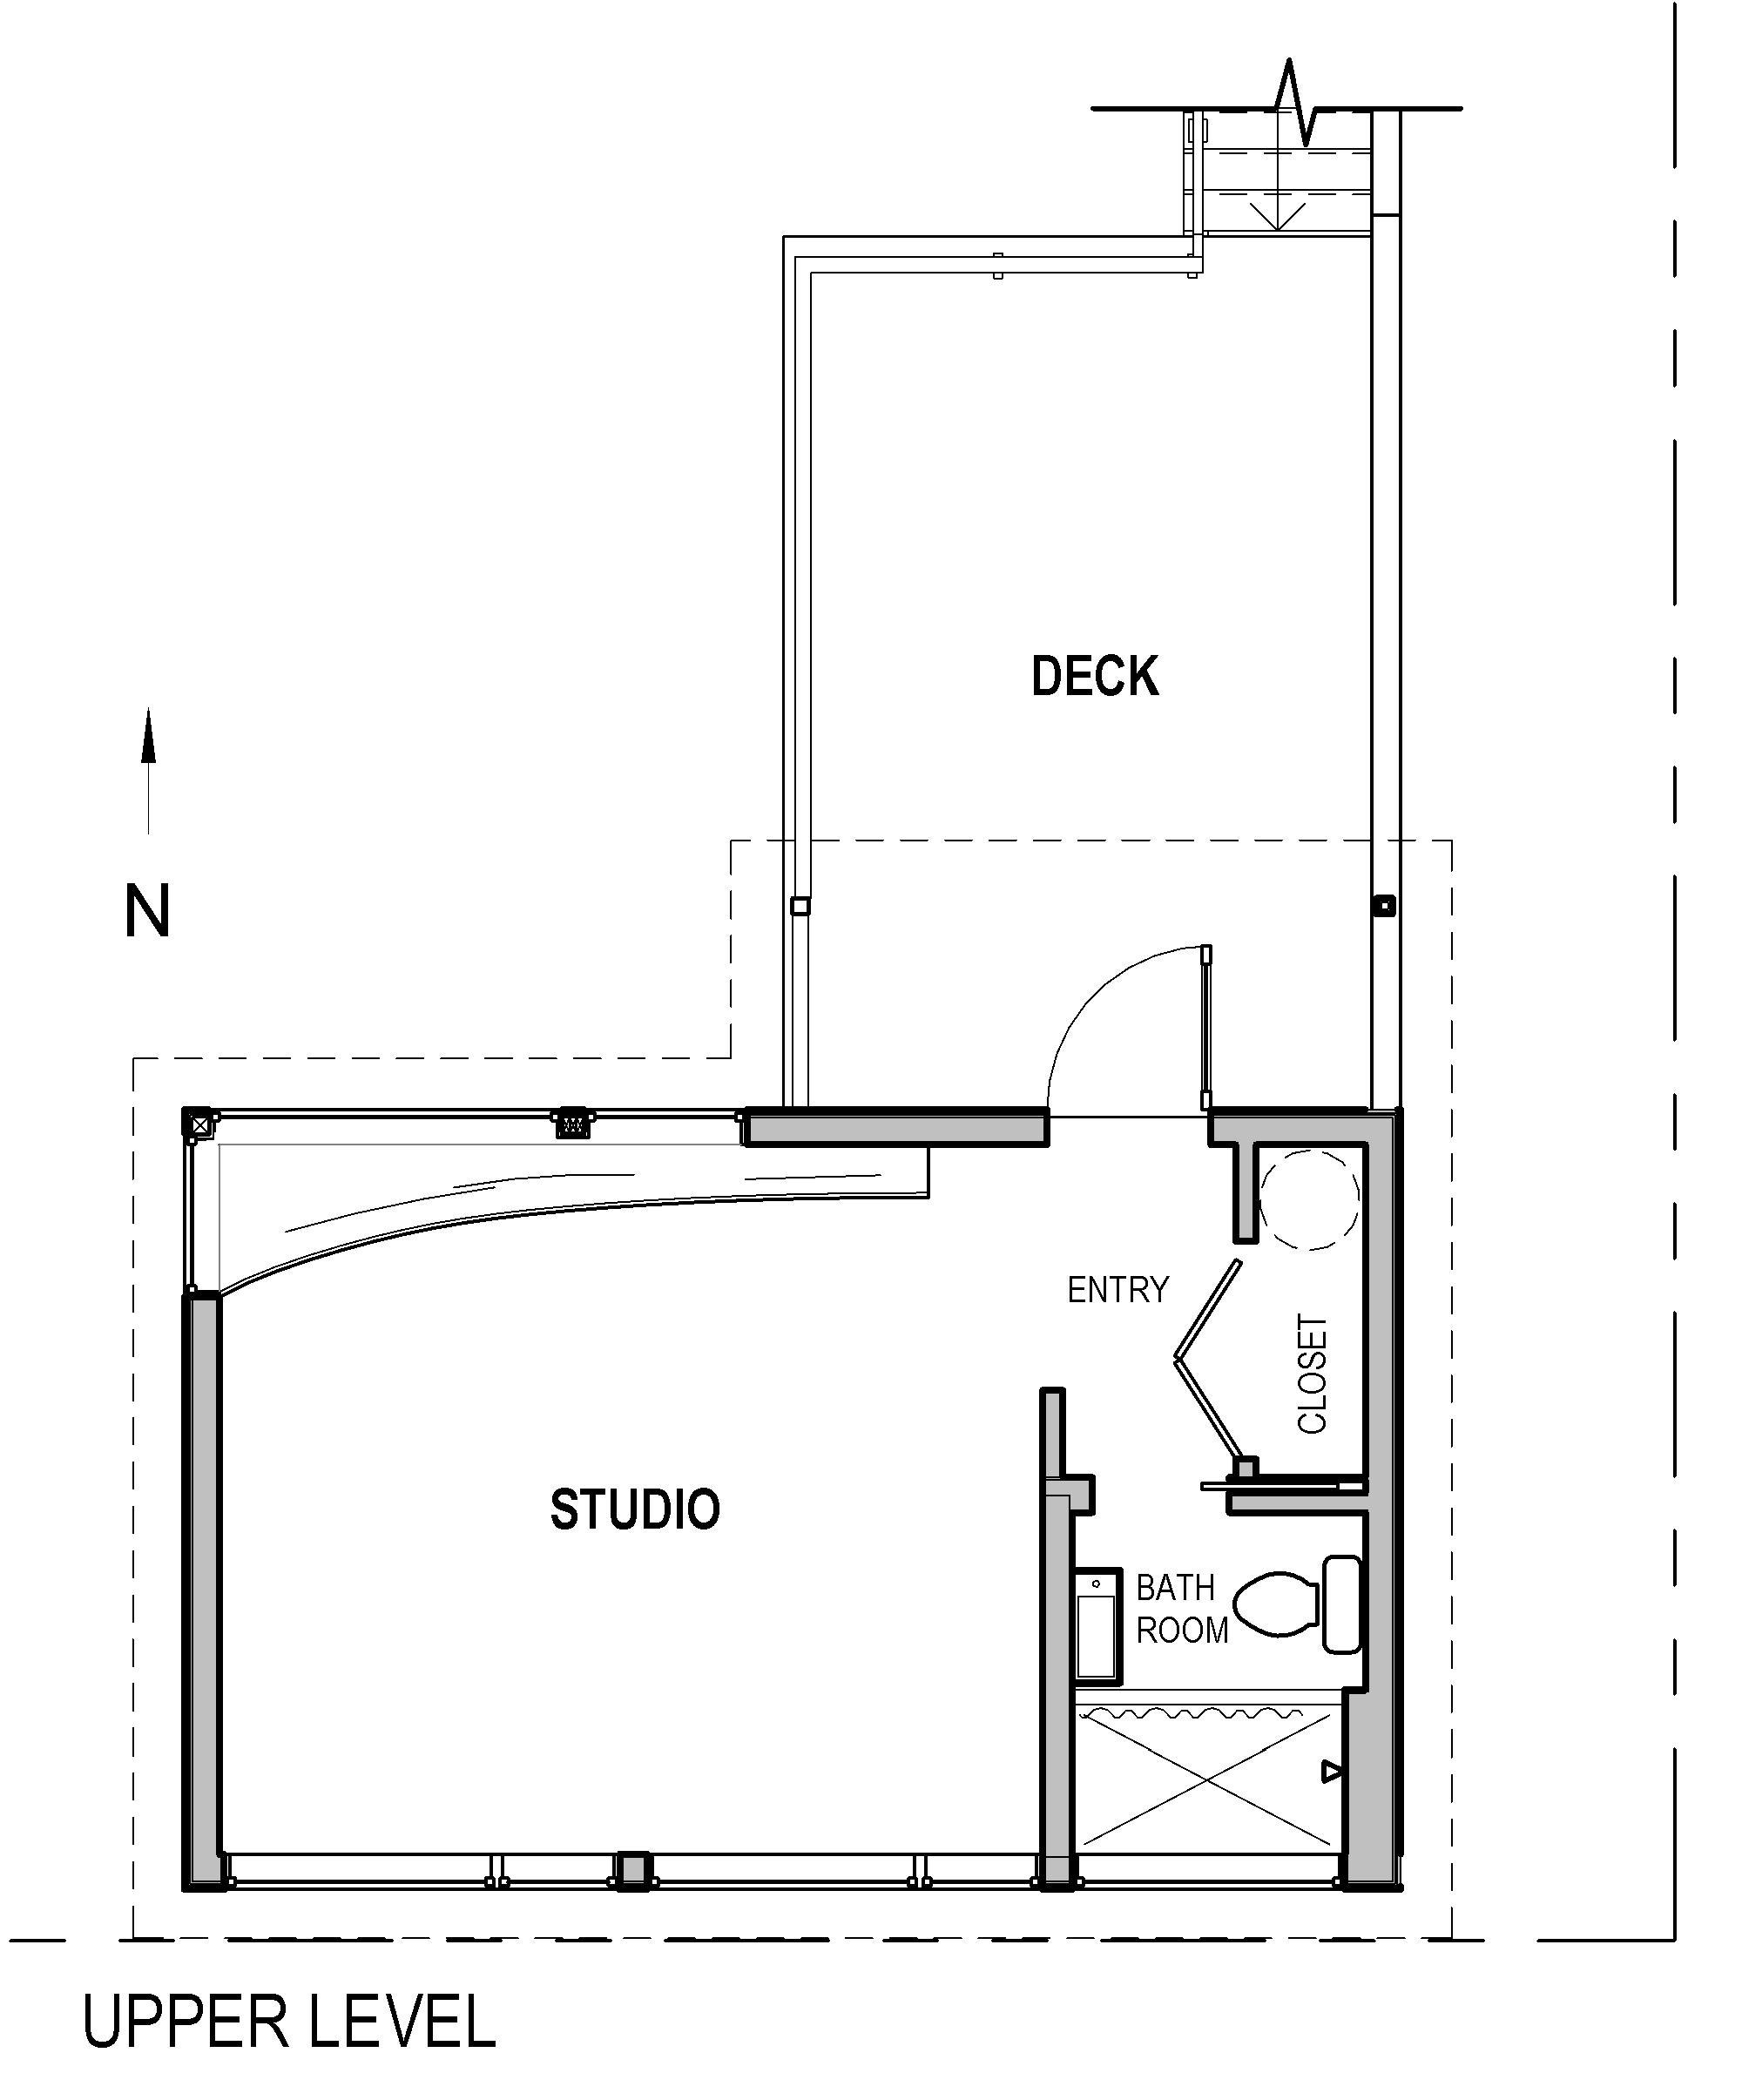 Gladstone studio and workshop - portland, or - level 2